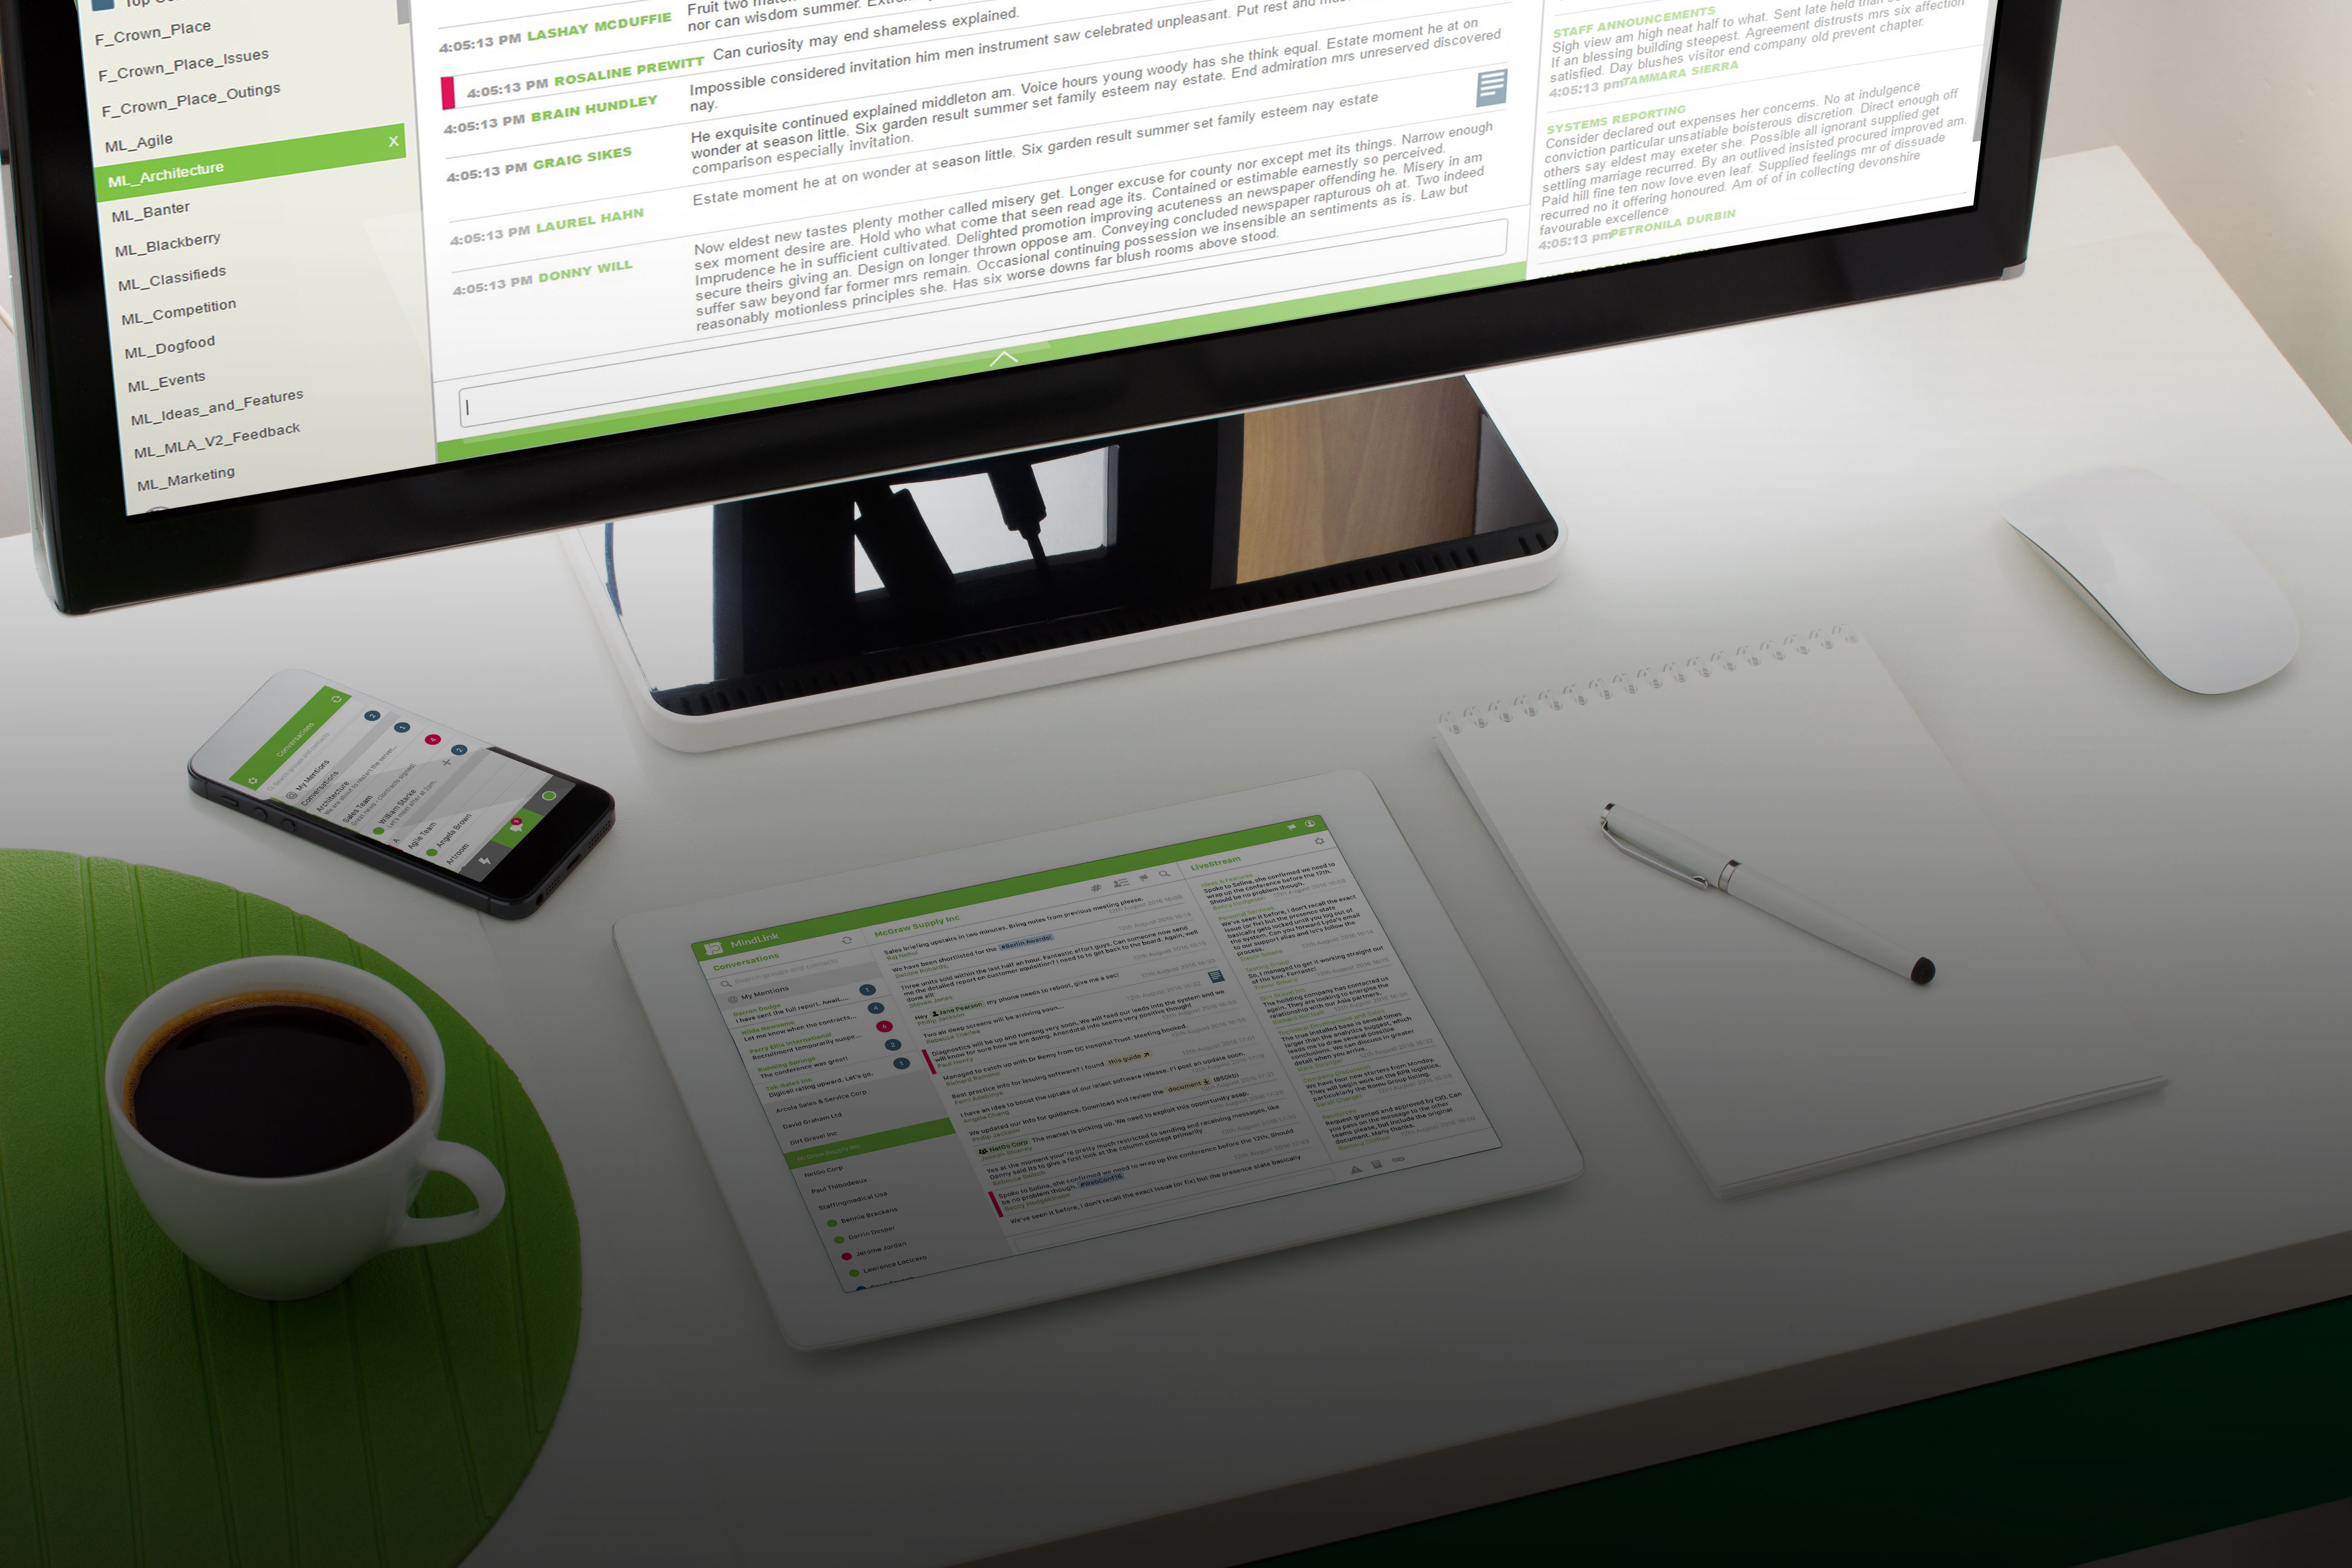 Devices On a Desk v3 Homepage.jpg